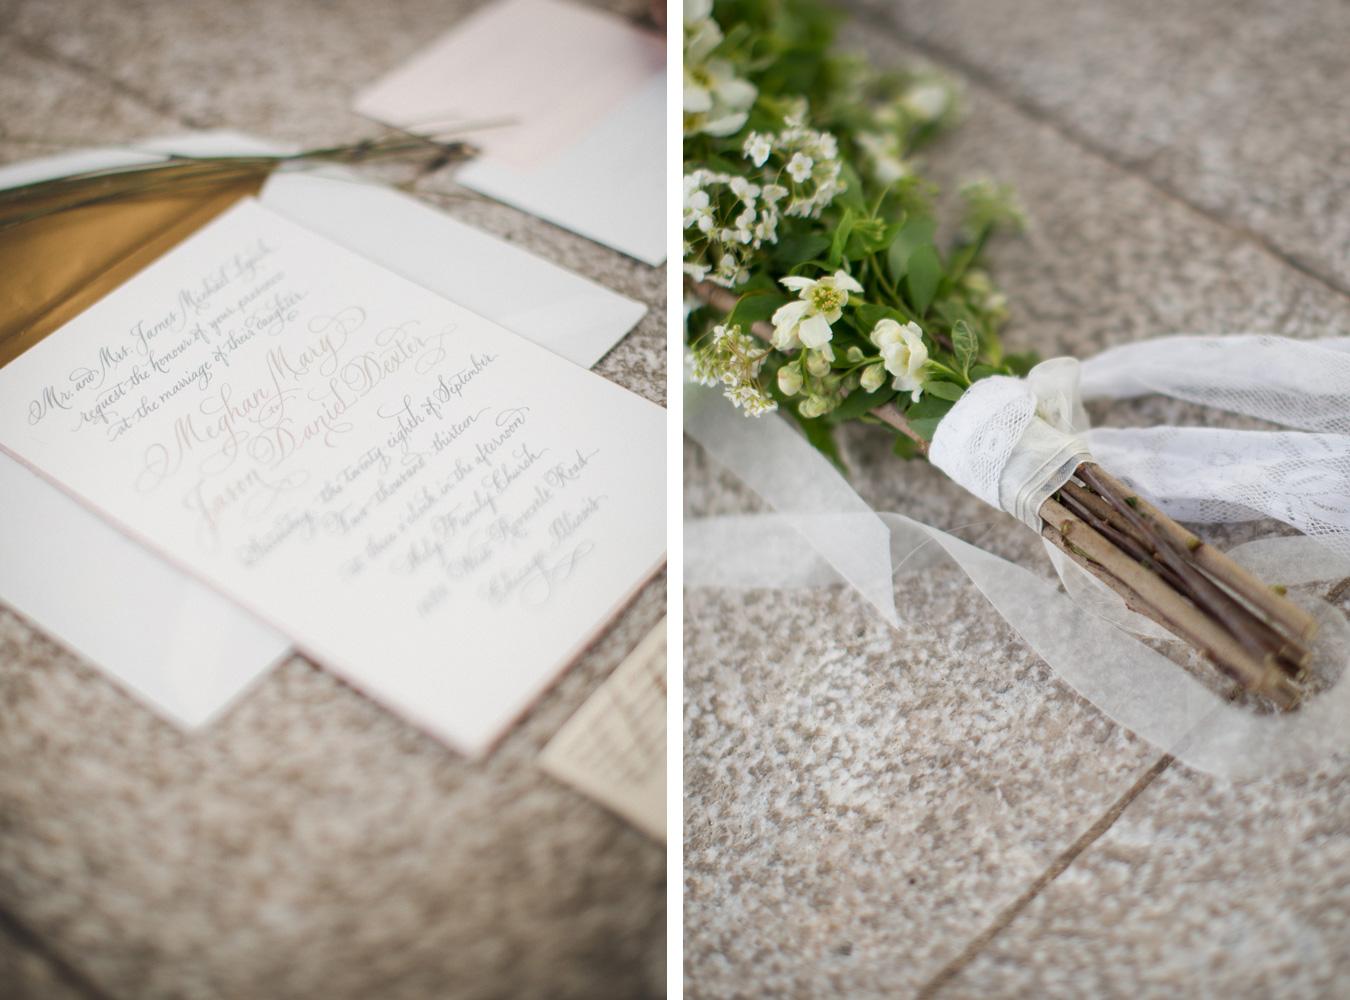 011-fotograf-tone-tvedt-bryllup-i-utlandet.jpg